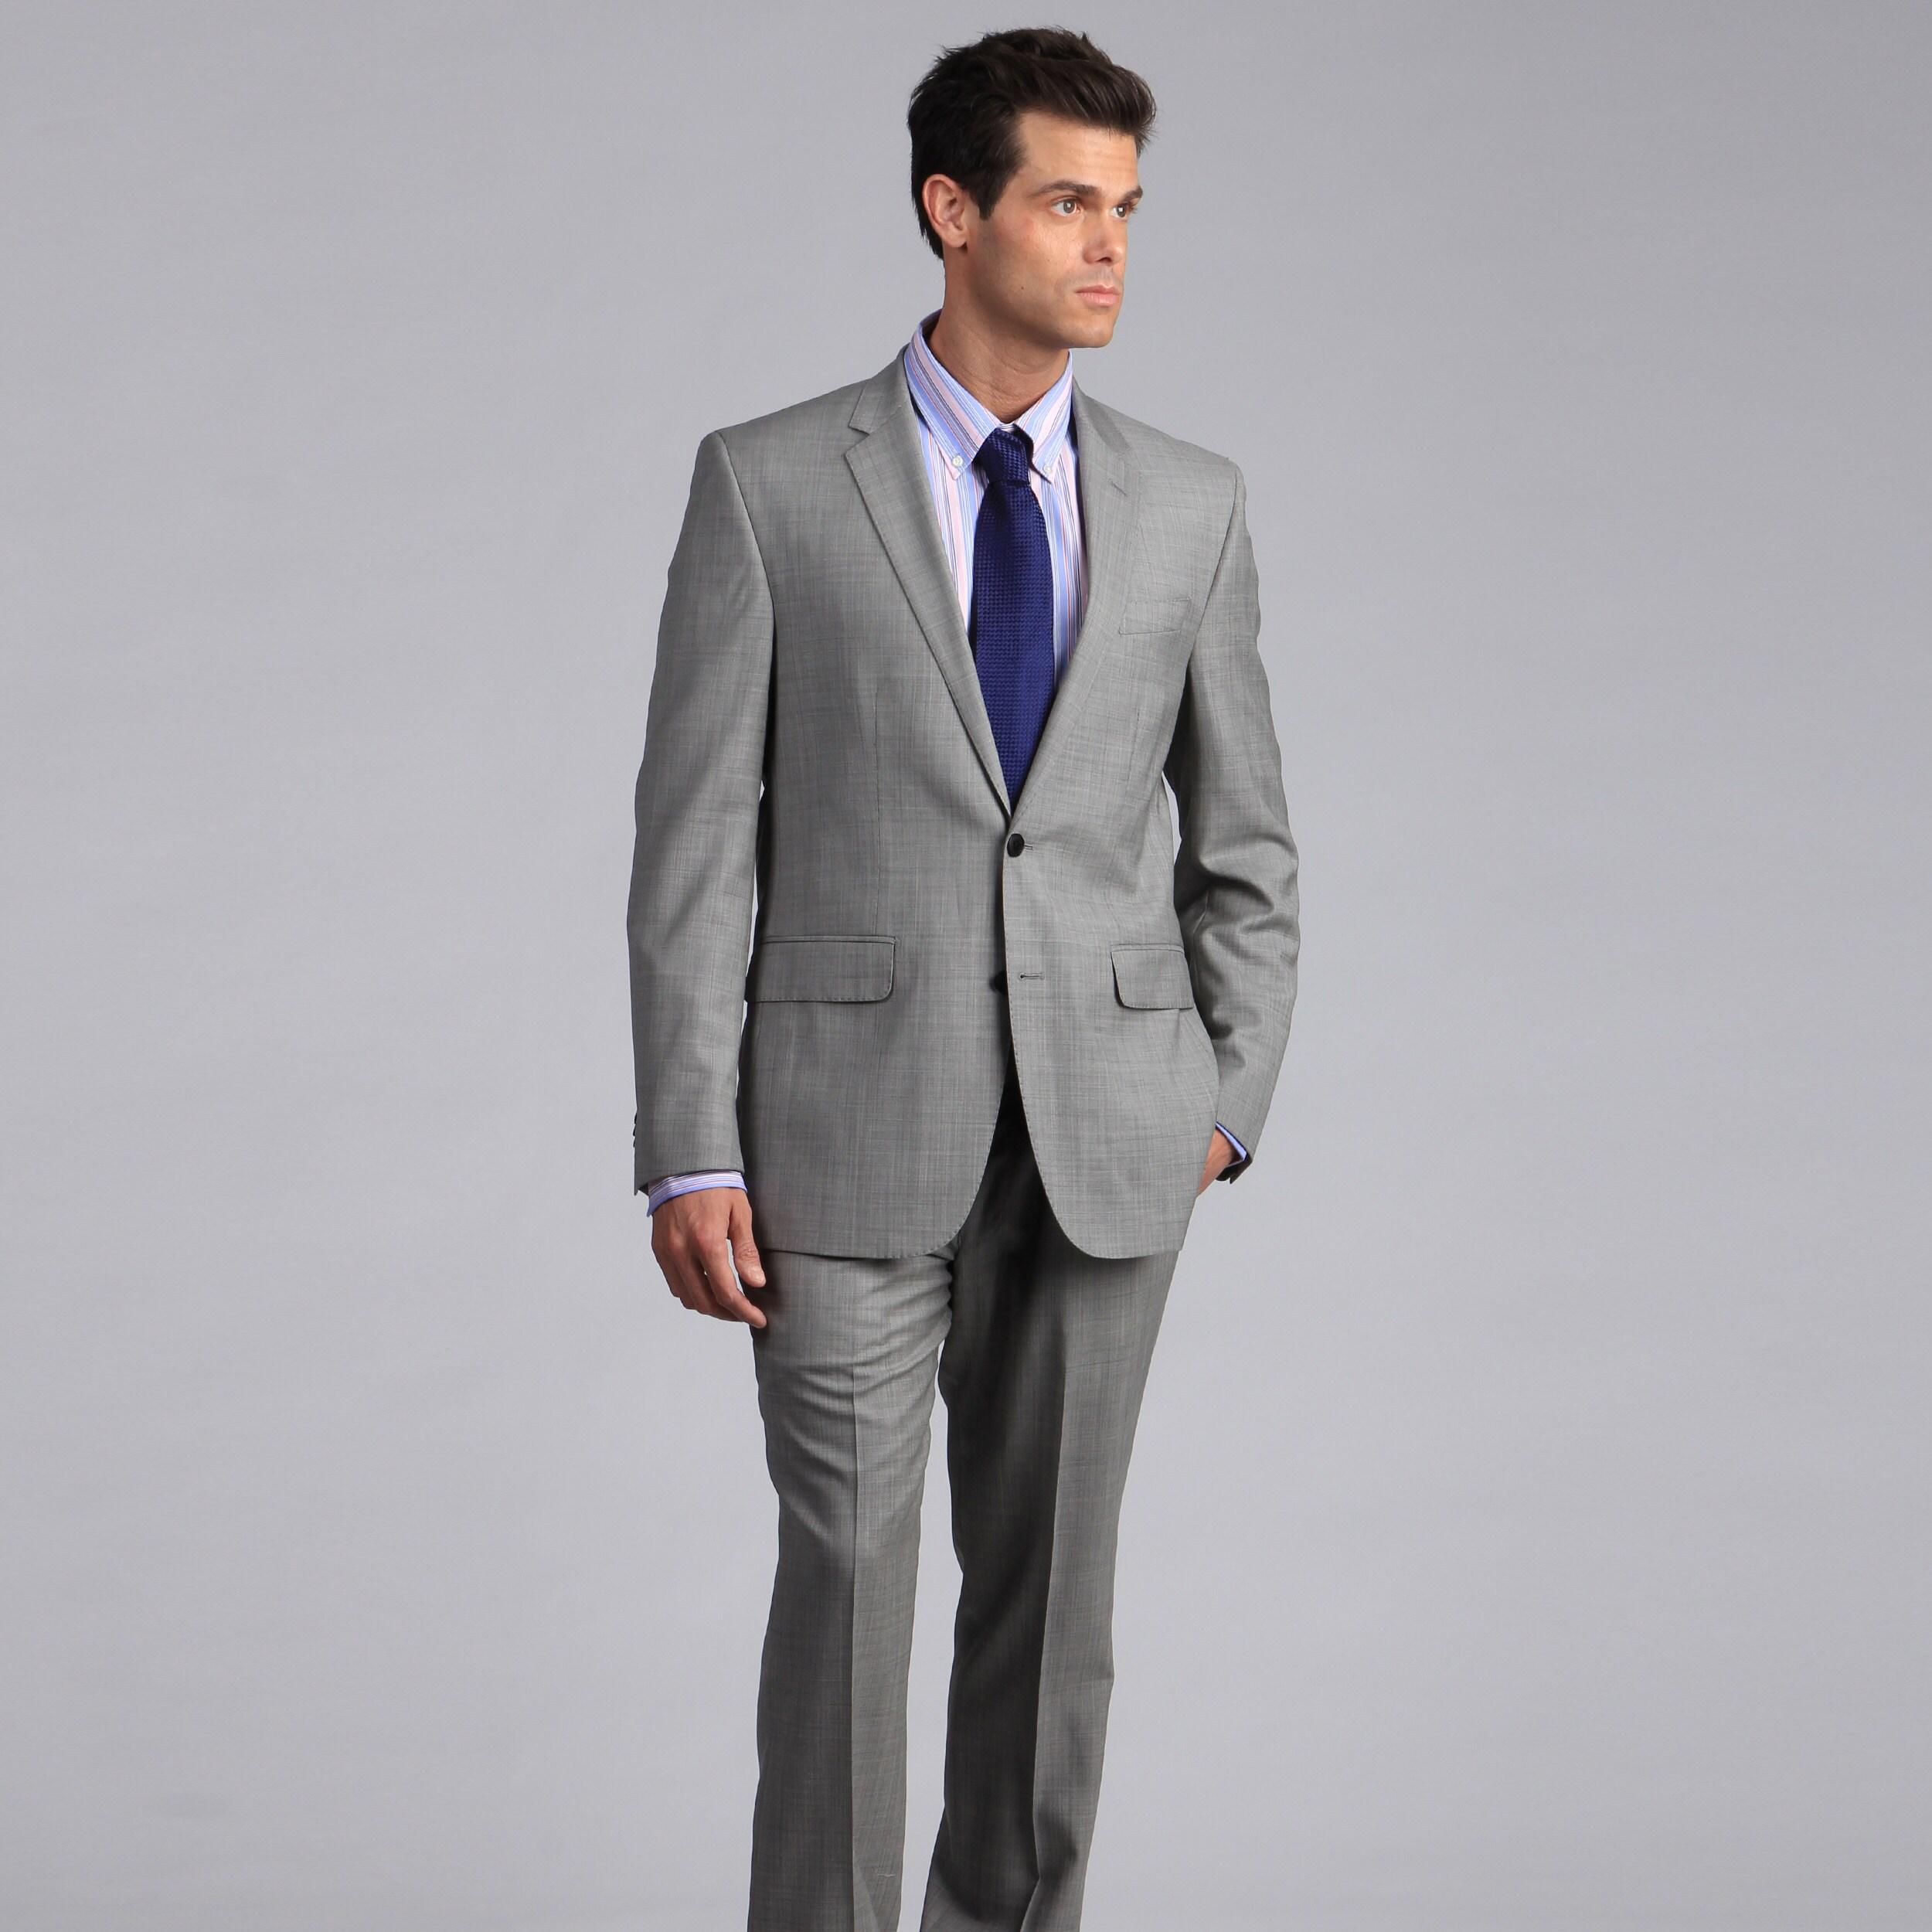 online suit plain grey suitsupply light gray pin store washington